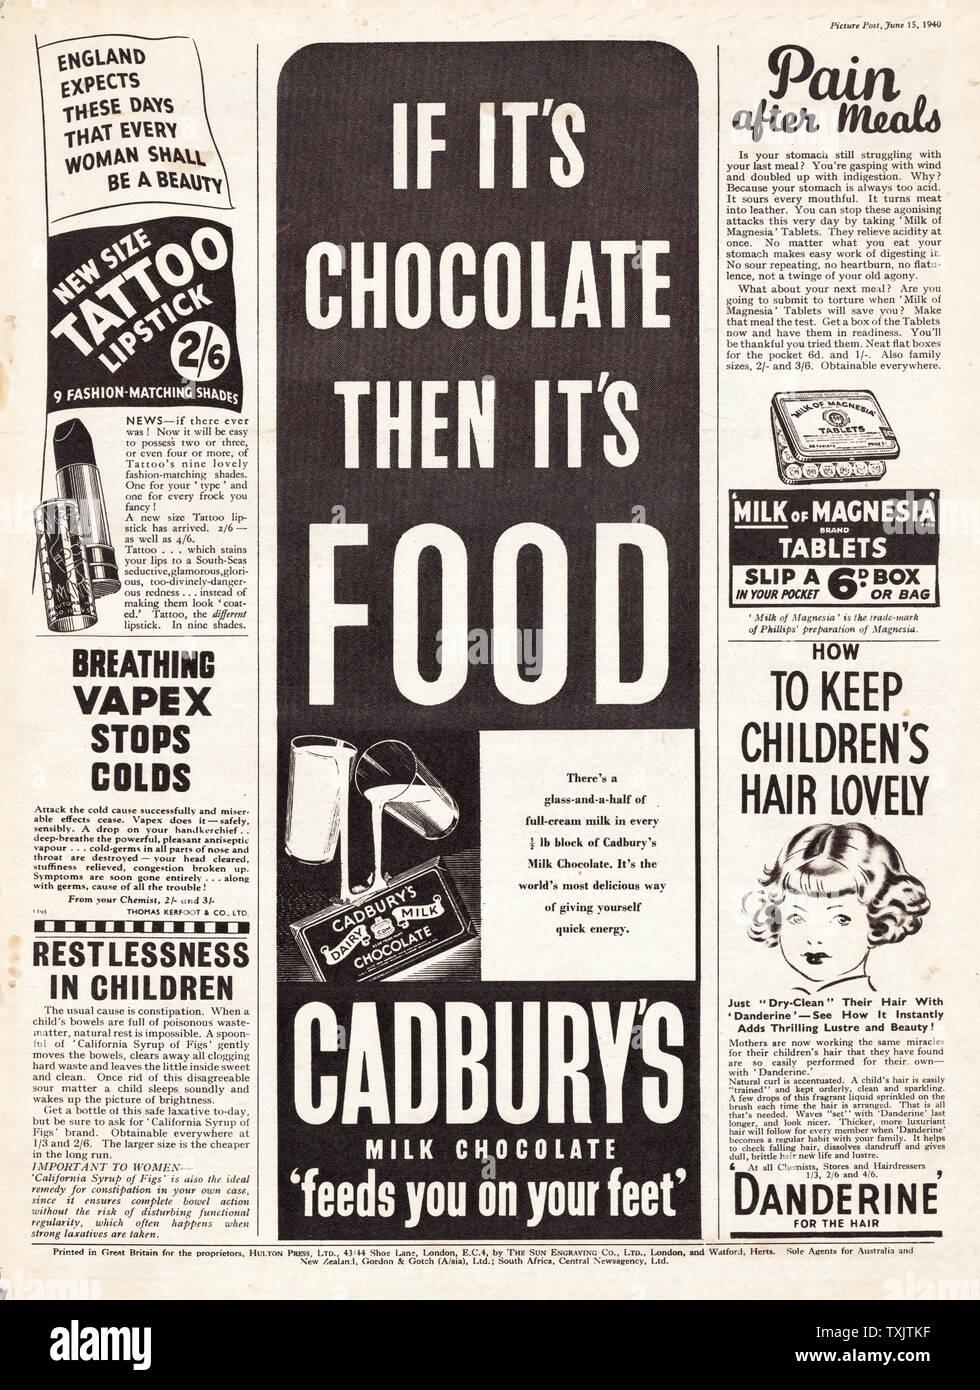 1940 UK Magazine Cadburys Milk Chocolate Advert Stock Photo - Alamy